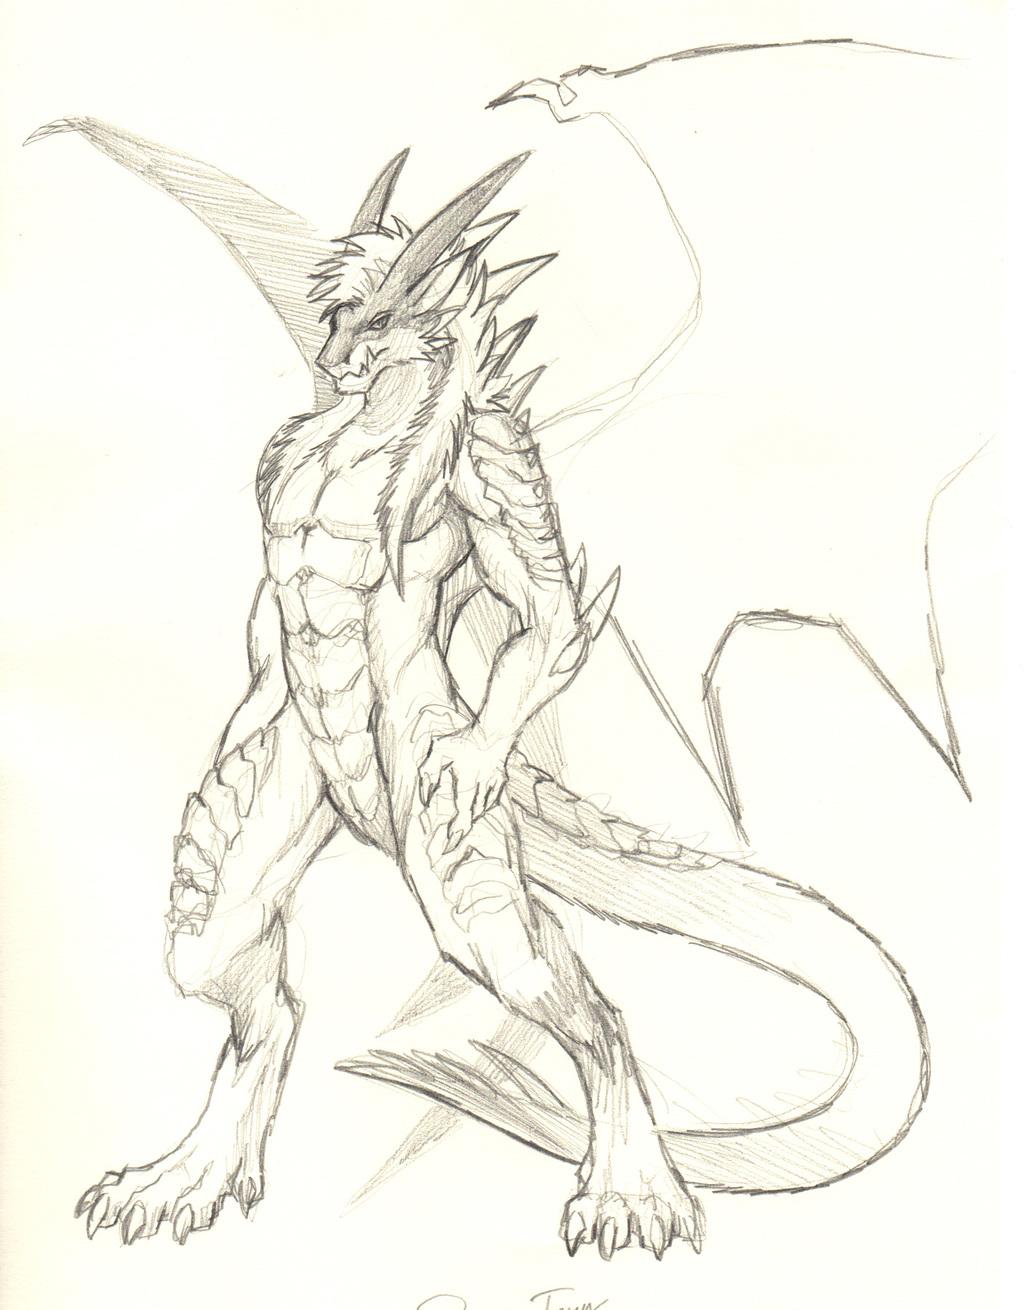 [ByoWT] Sketchbook Page 5 - Punk Rock Demon